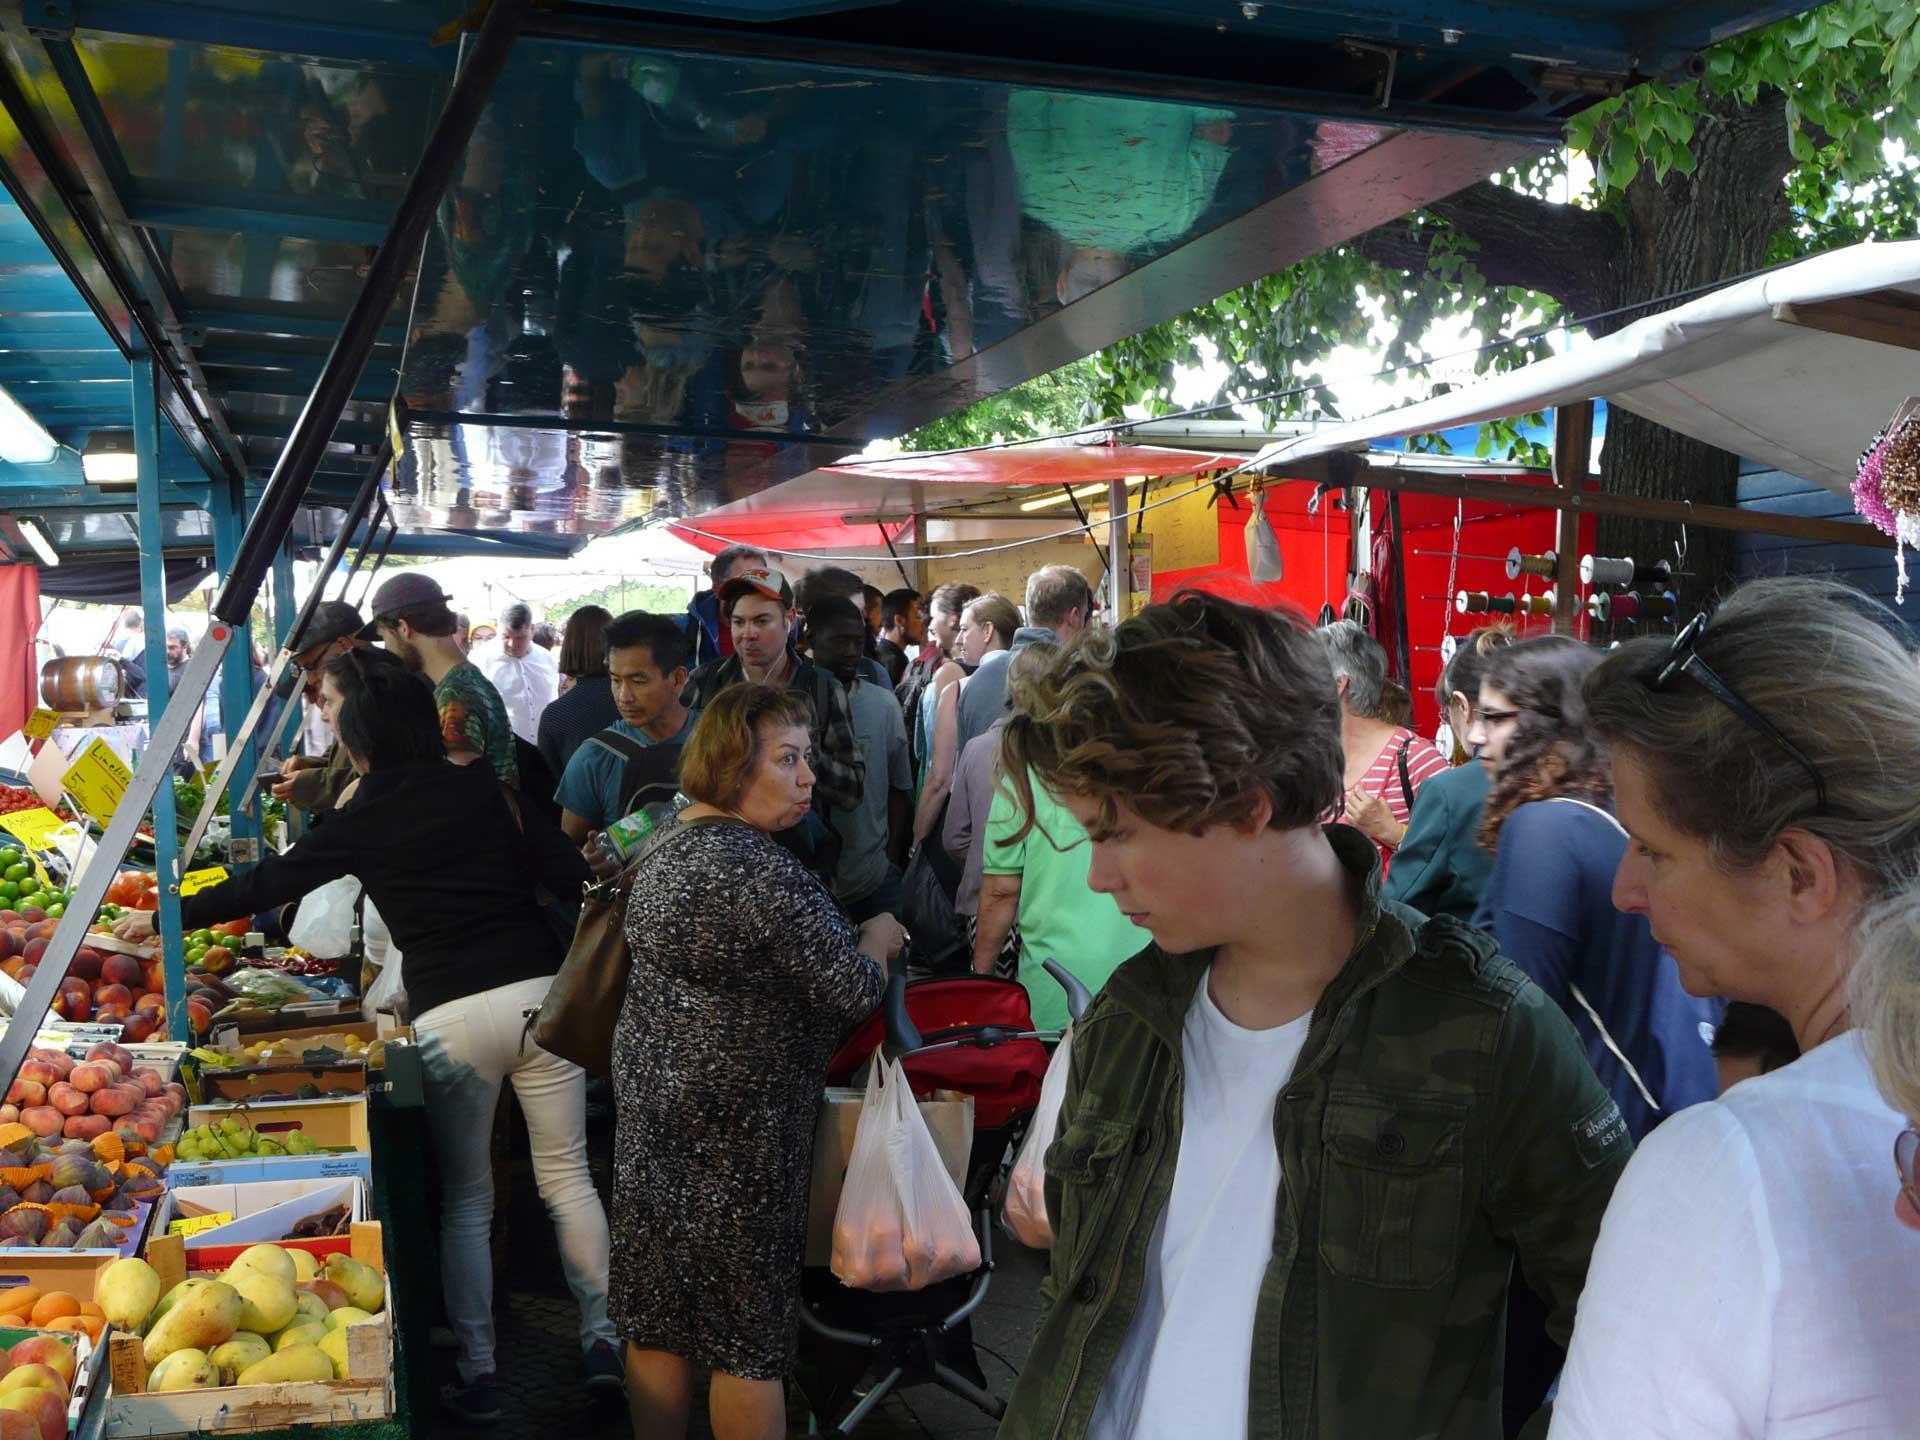 Flohmarkt berlin am sonntag